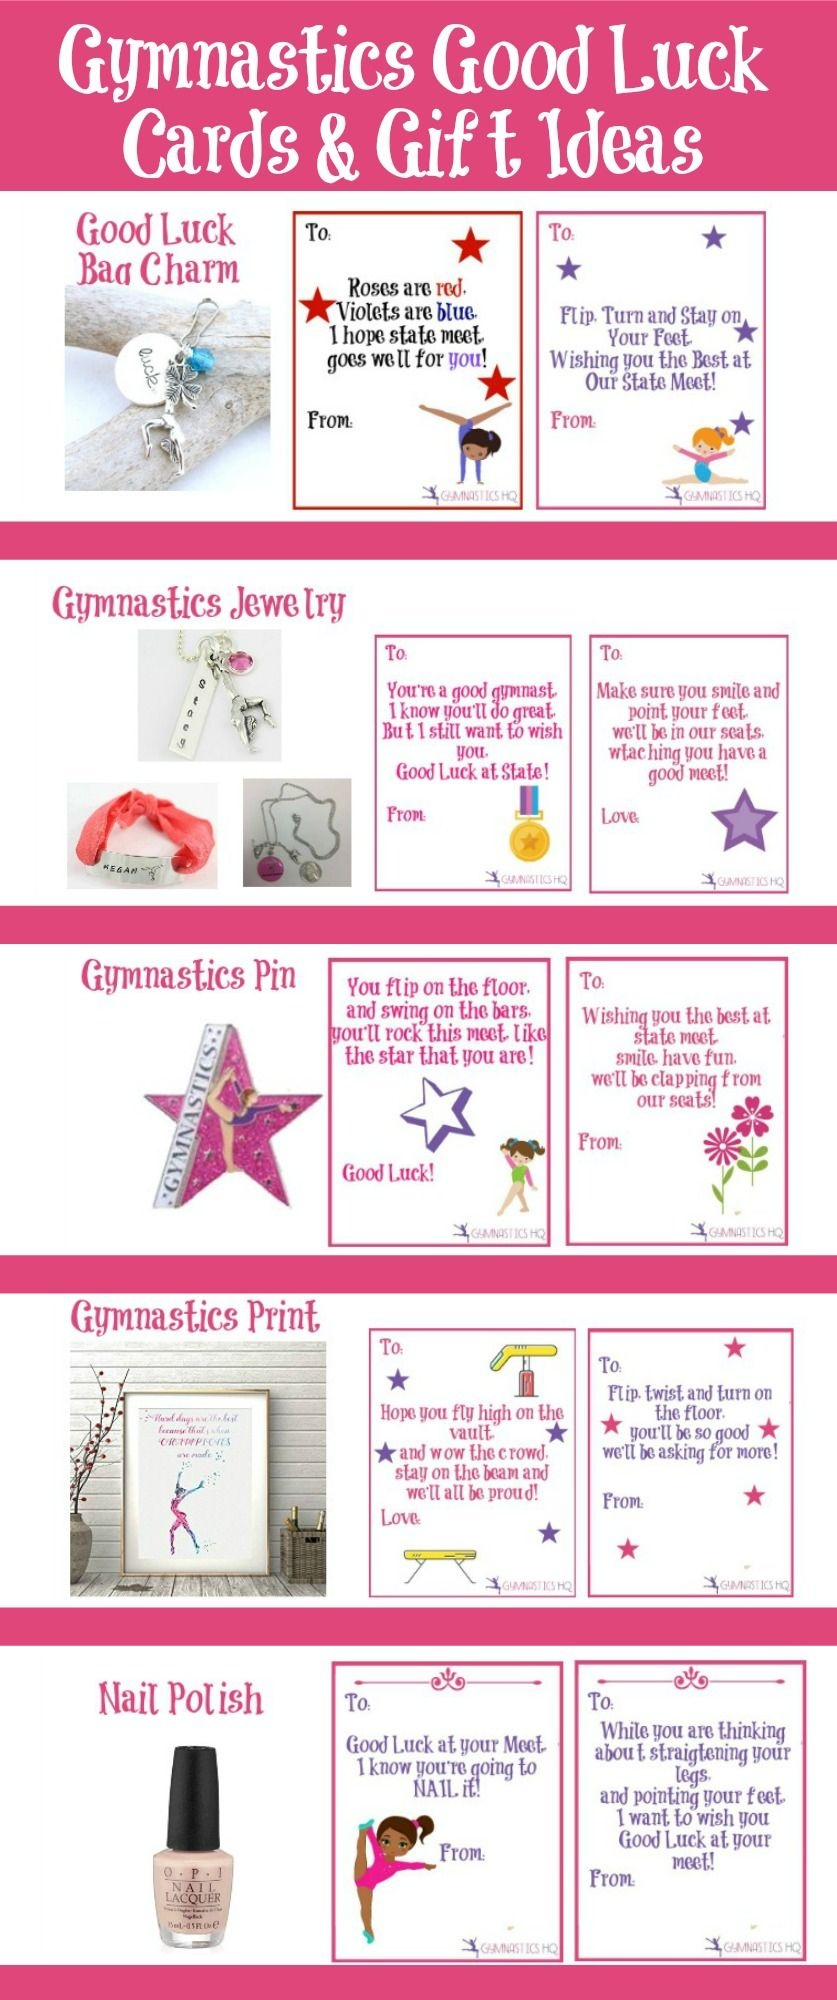 Gymnastics Good Luck Gift Ideas Along With Free Printable Good Luck - Free Printable Good Luck Cards